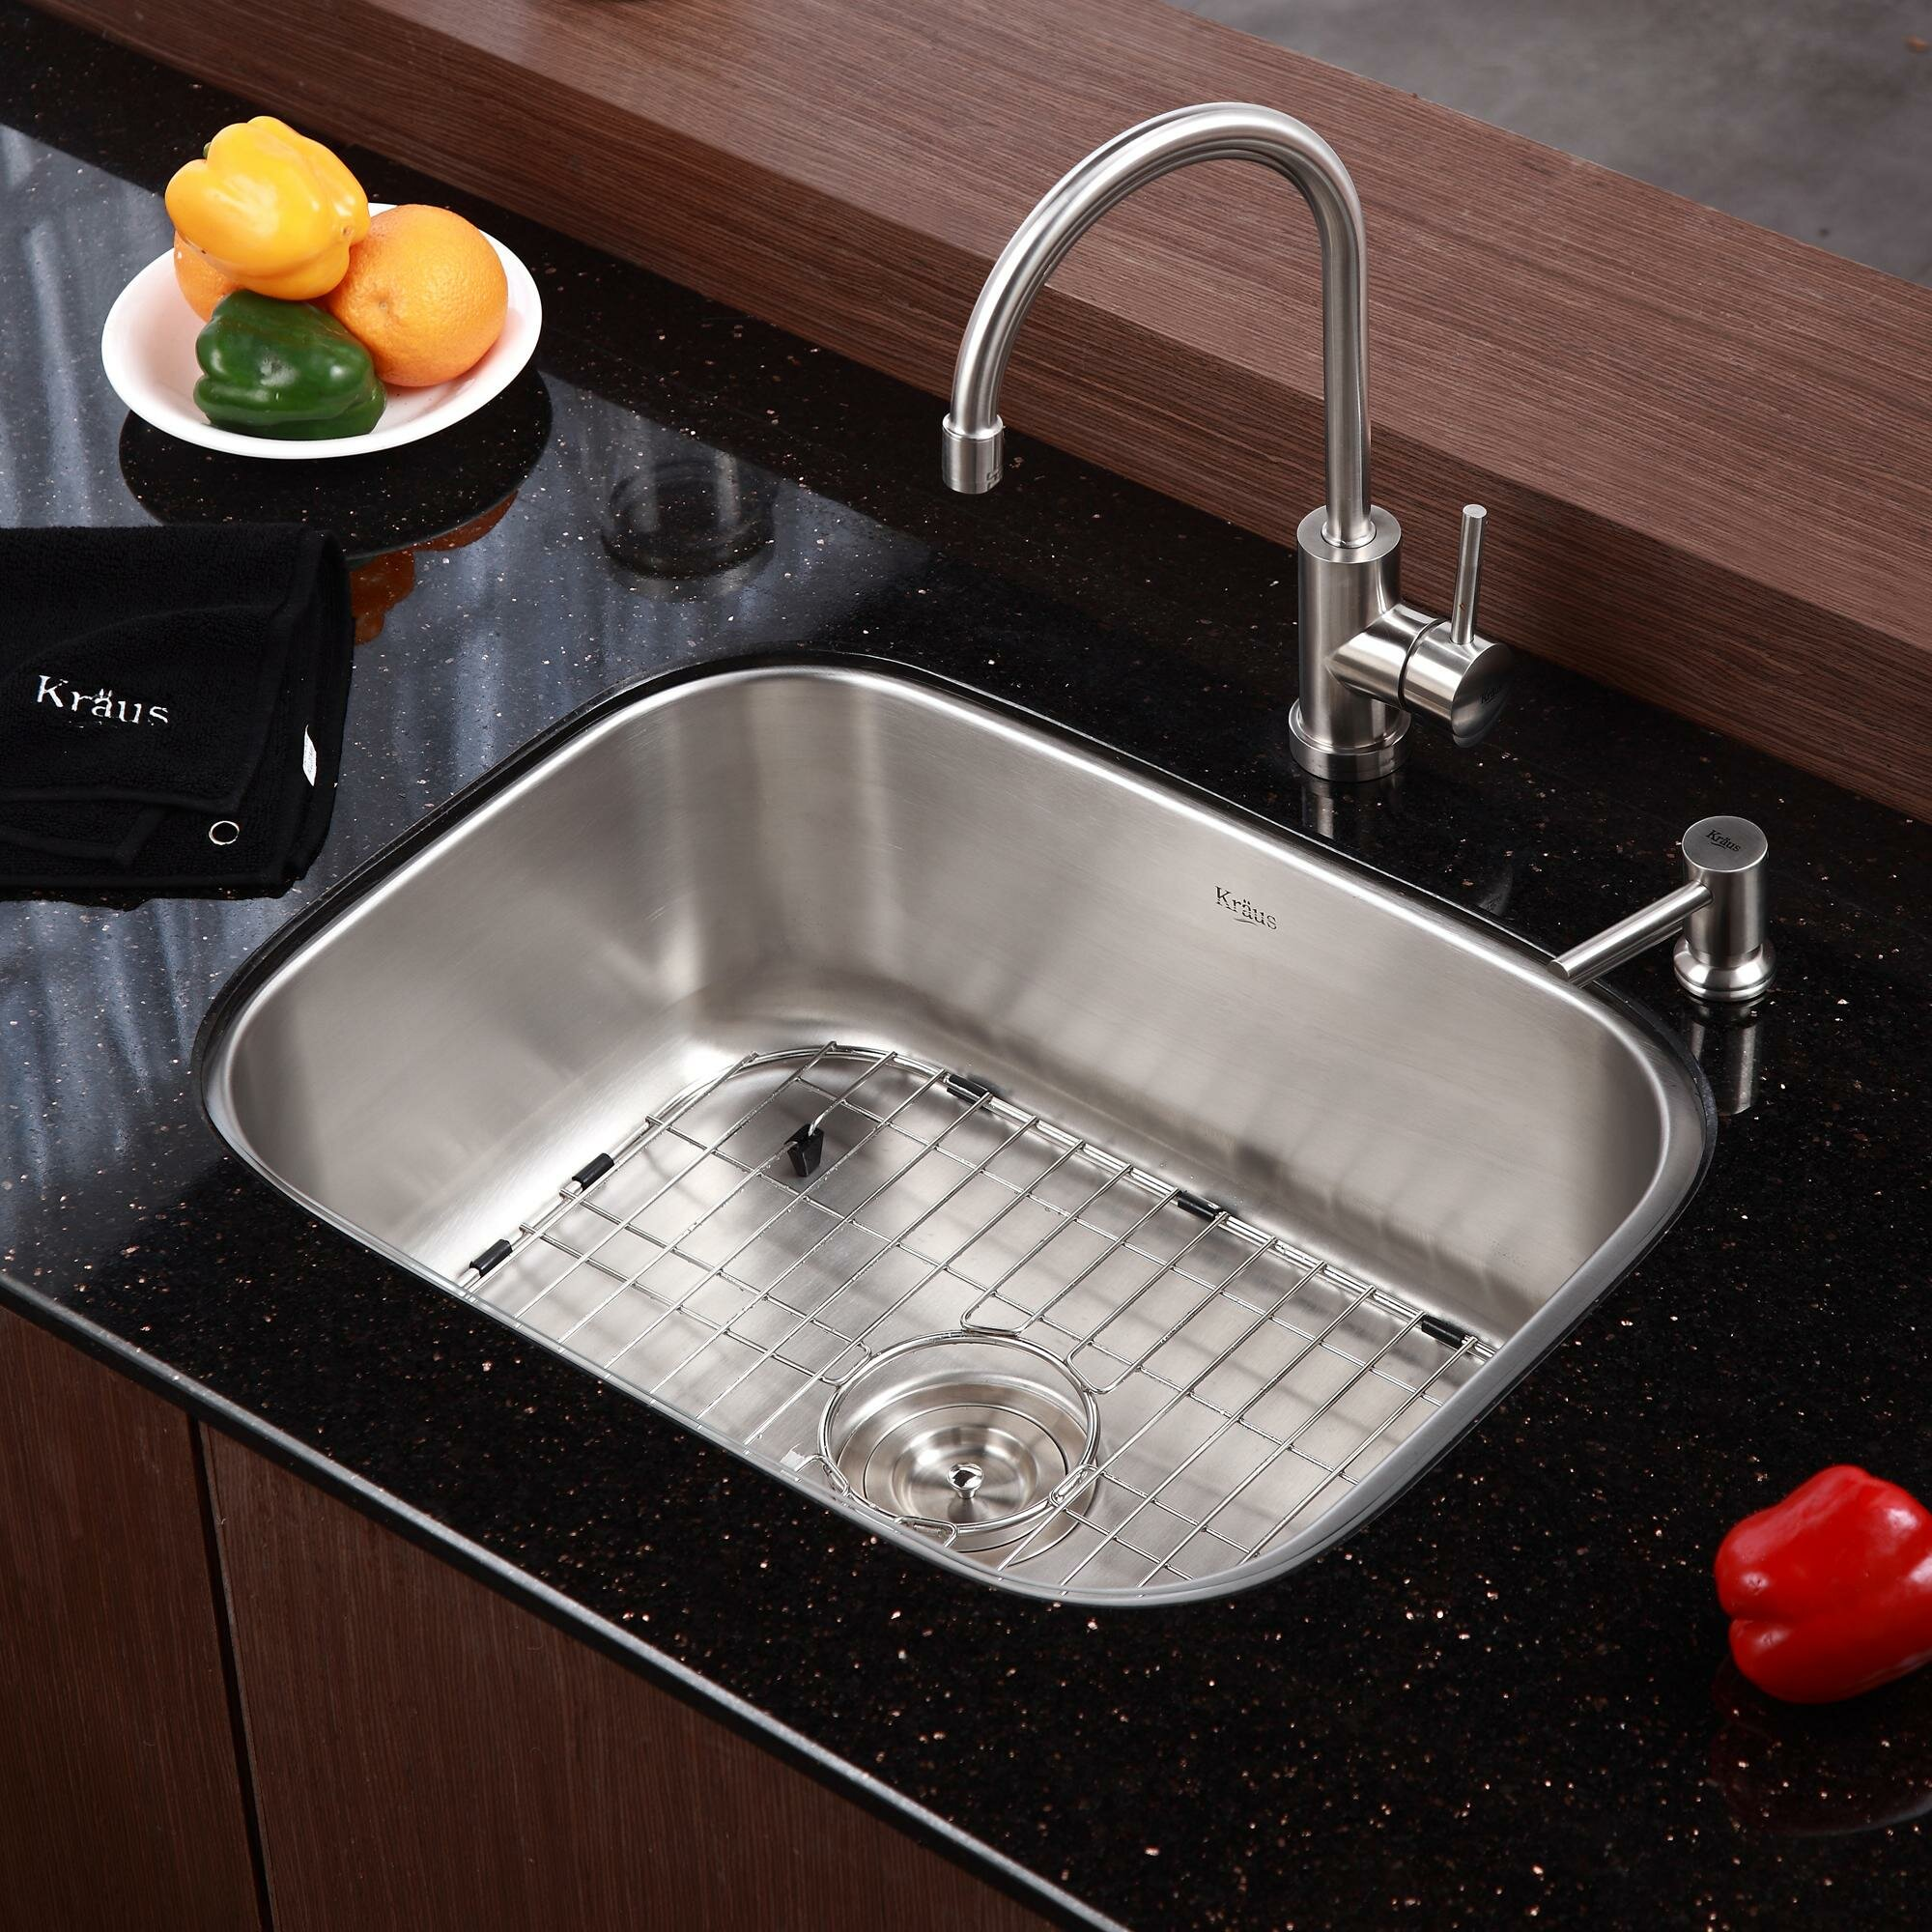 Kraus Stainless Steel 23 X 17 6 Undermount Single Bowl Kitchen Sink With 14 3 Kitchen Faucet